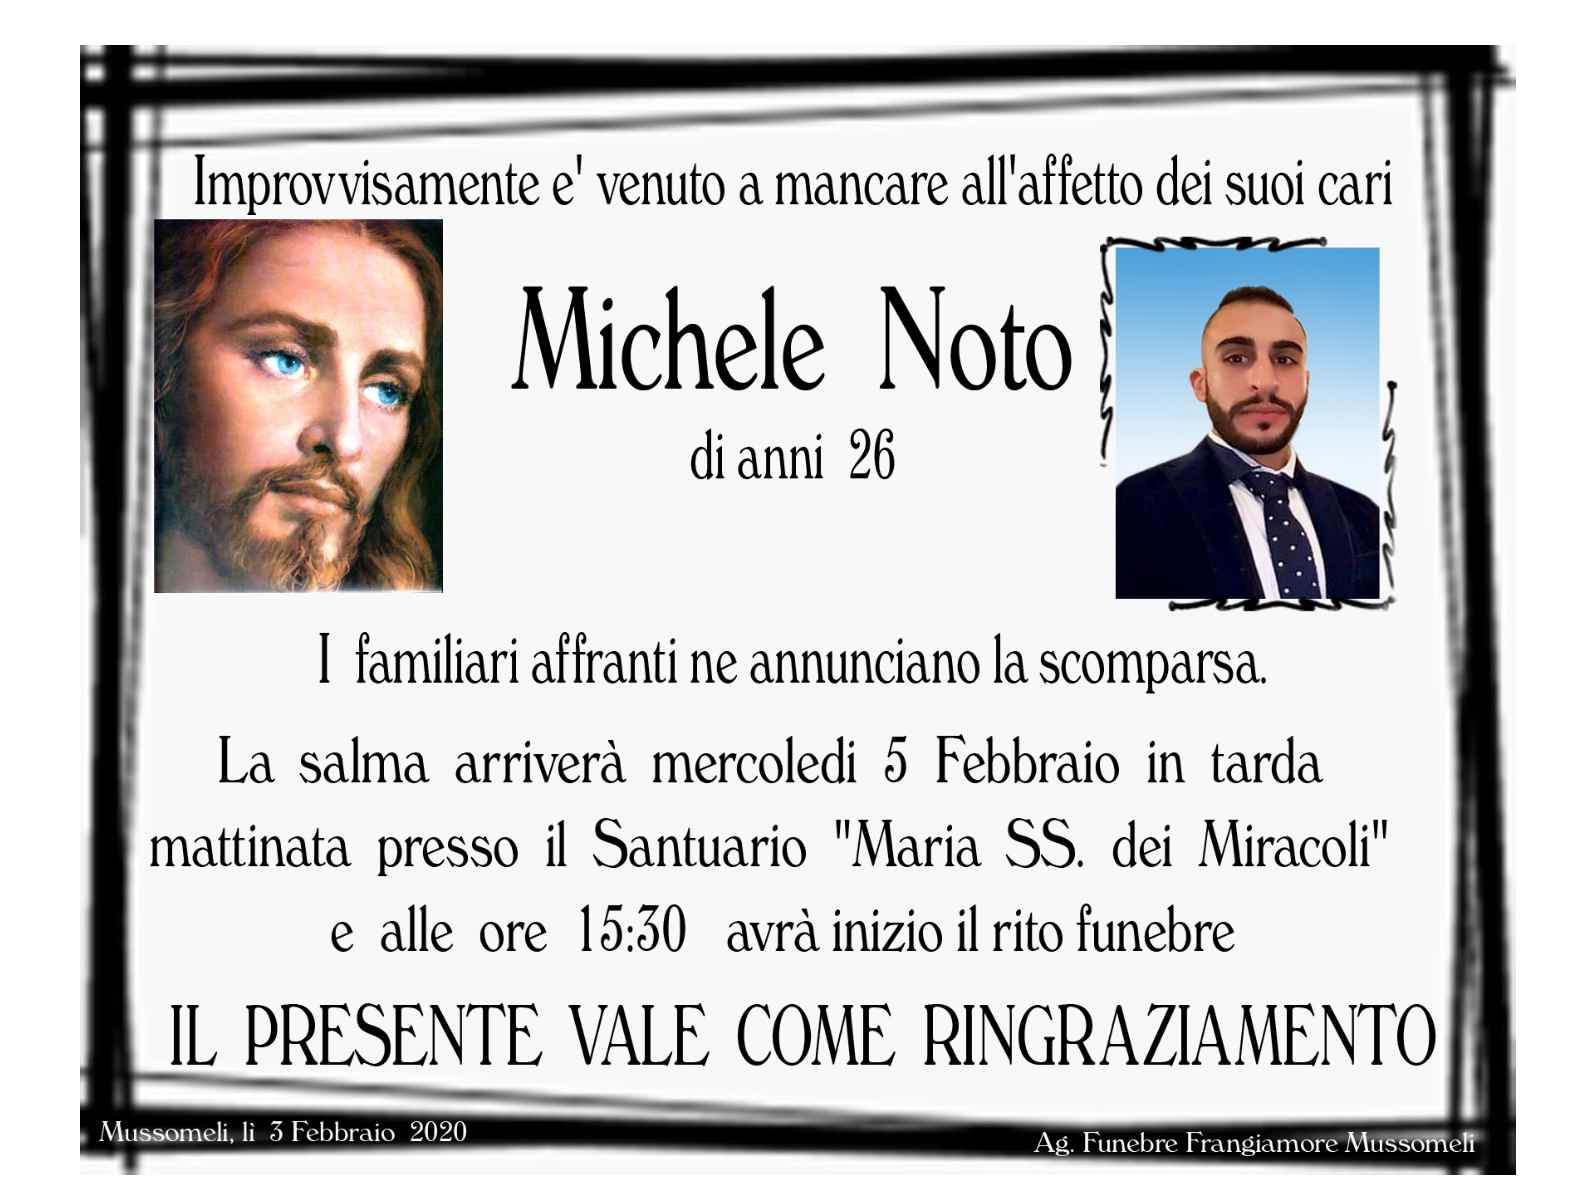 Michele Noto